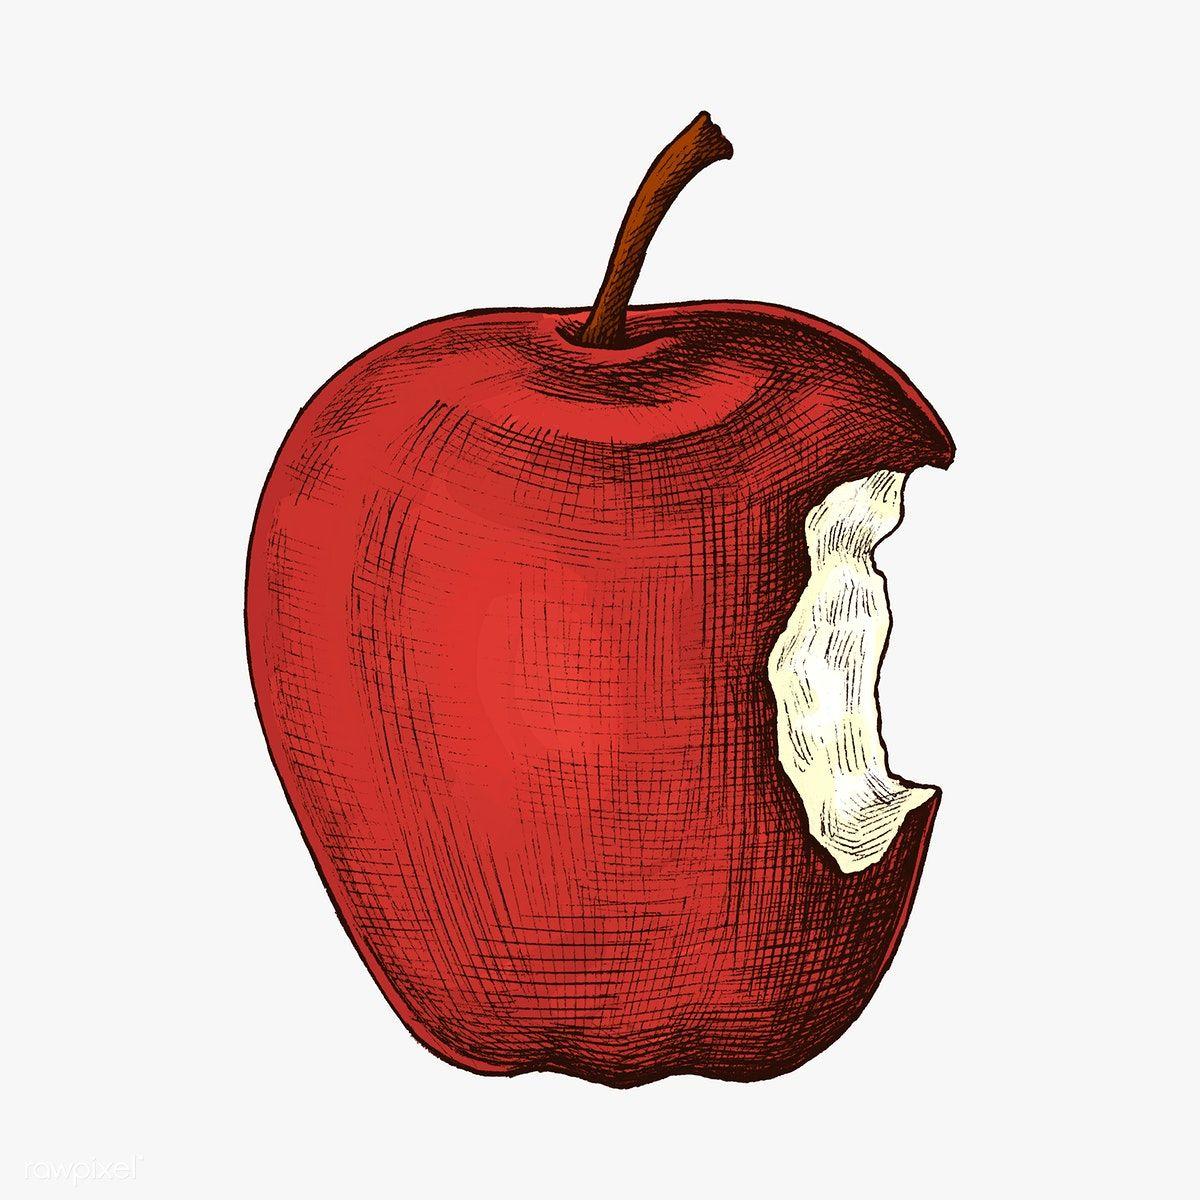 Download Premium Illustration Of Fresh Ripe Bitten Red Apple Illustration Apple Illustration Apple Tattoo Apple Art